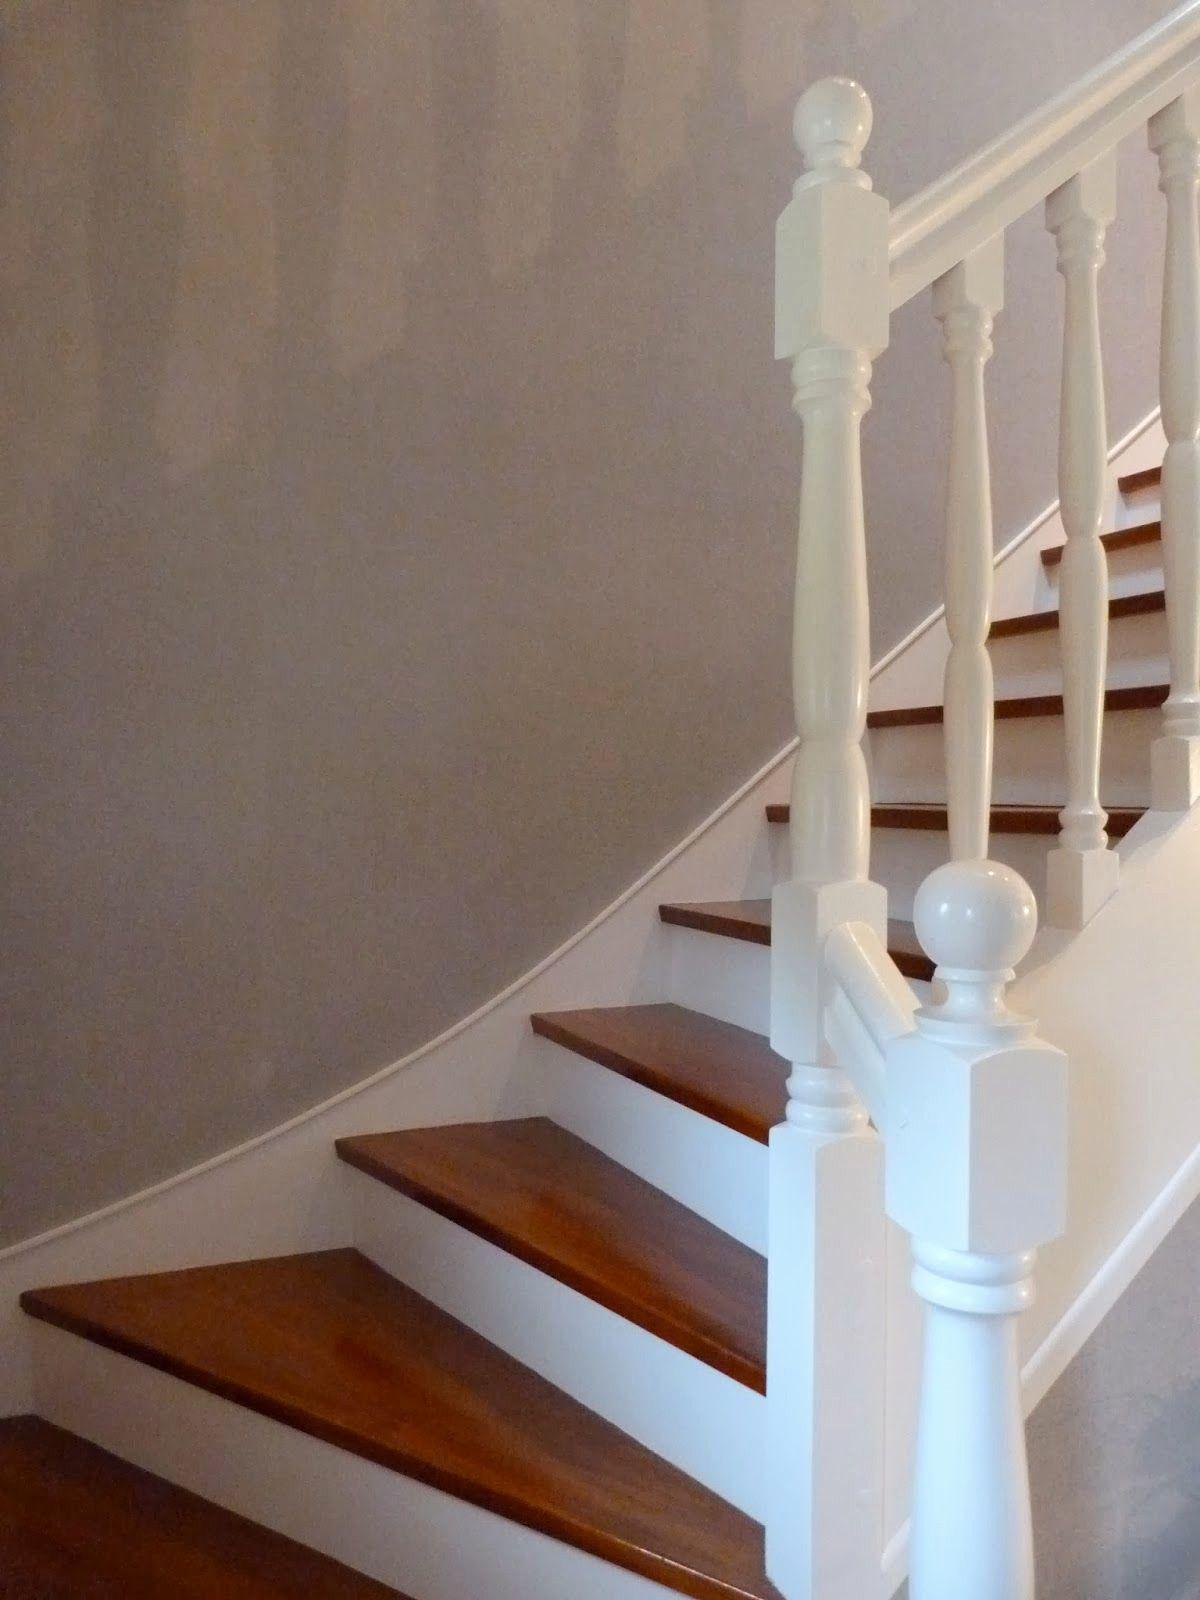 Elegant Peinture Escalier Bois Gris Idee Deco Escalier Peinture Escalier Et Decoration Escalier